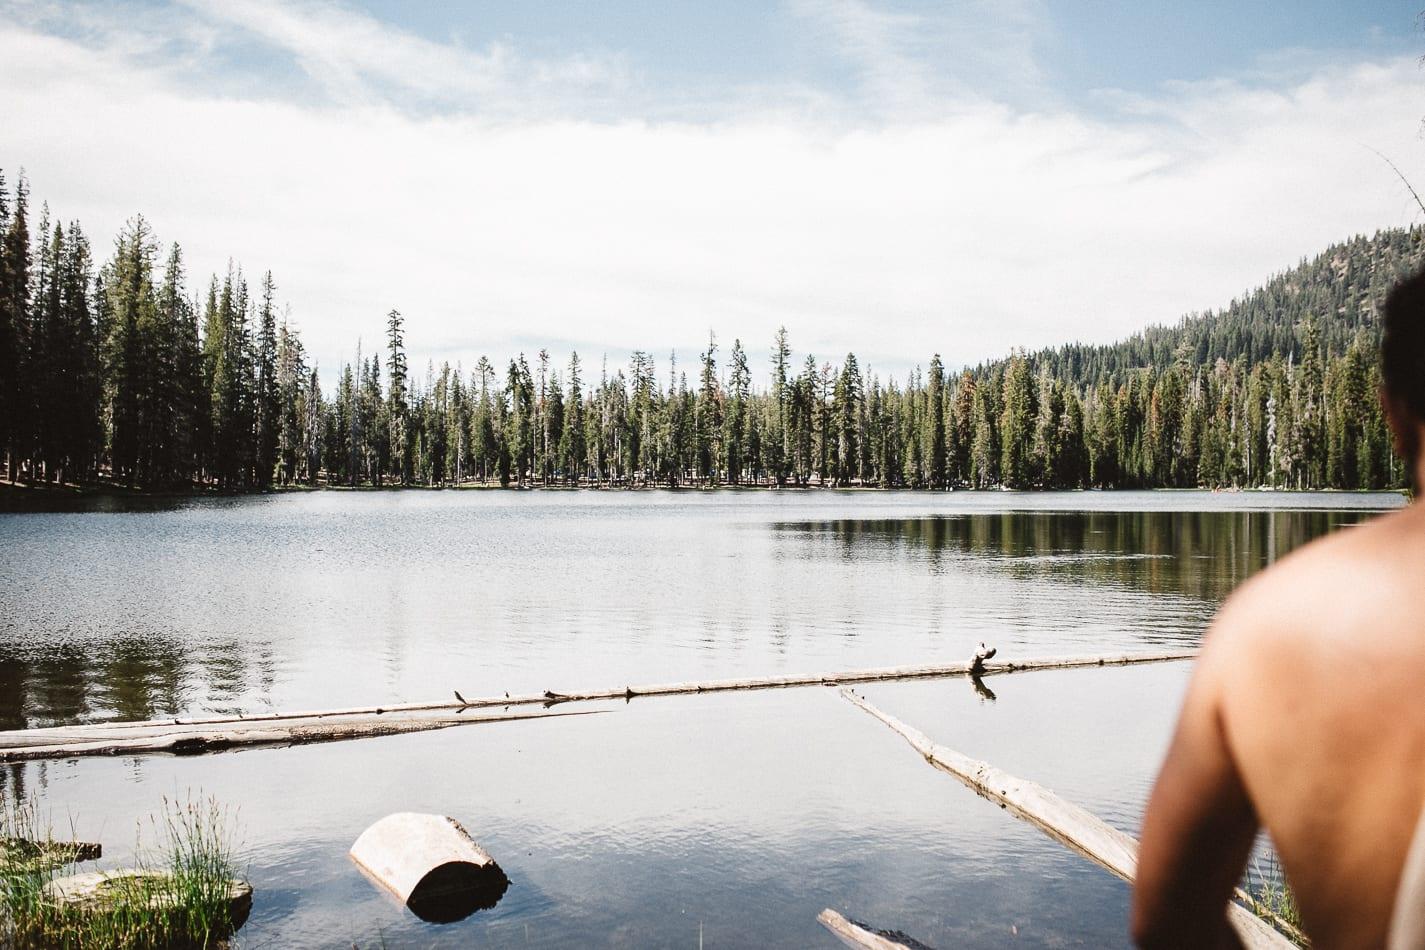 mount-lassen-california-adventure-lifestyle-photorapher-3